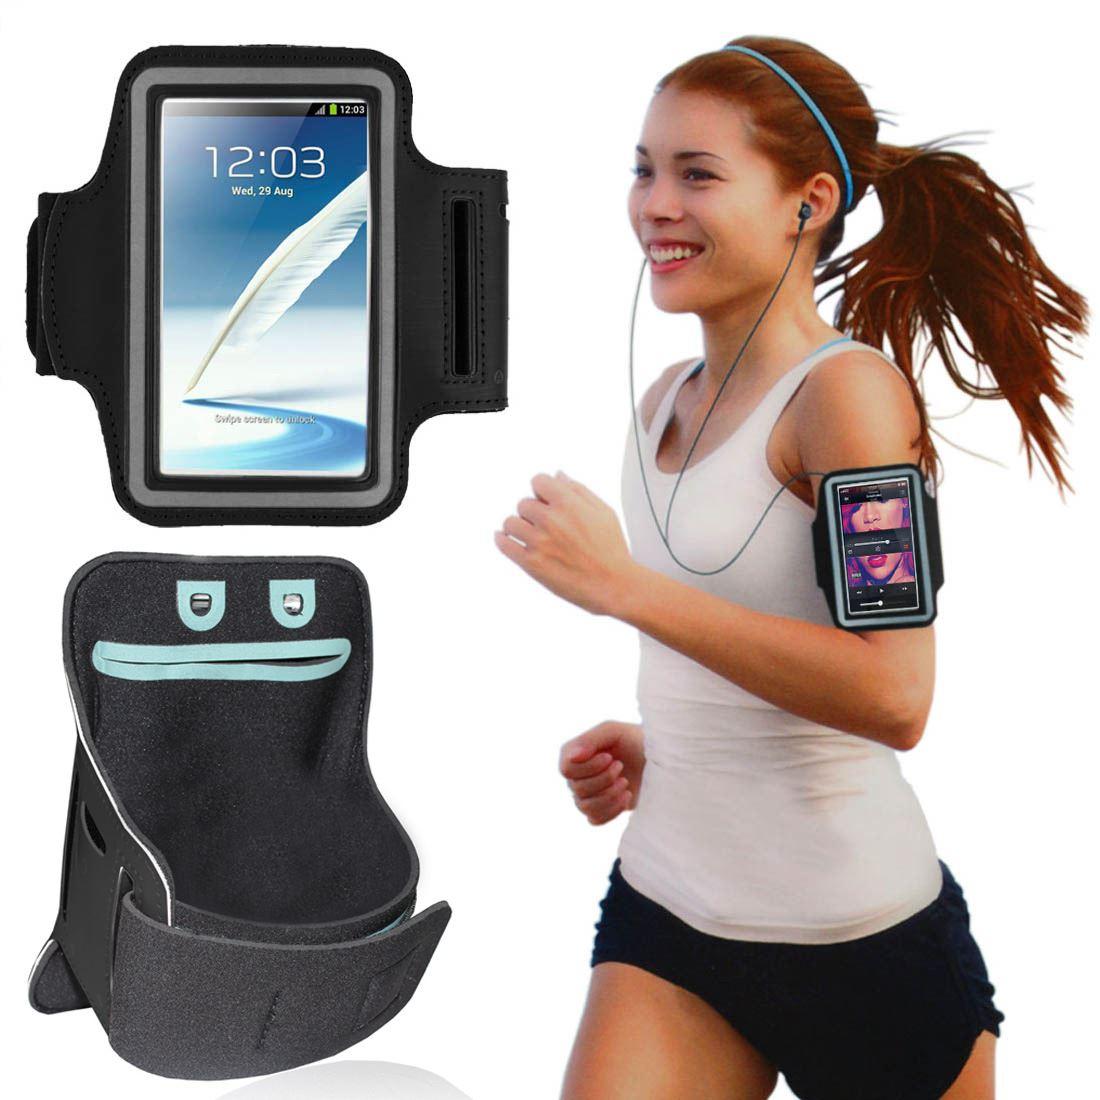 UK-Sports-Jogging-Running-Gym-Armband-Phone-Holder-Case-Cover-For-Various-Model